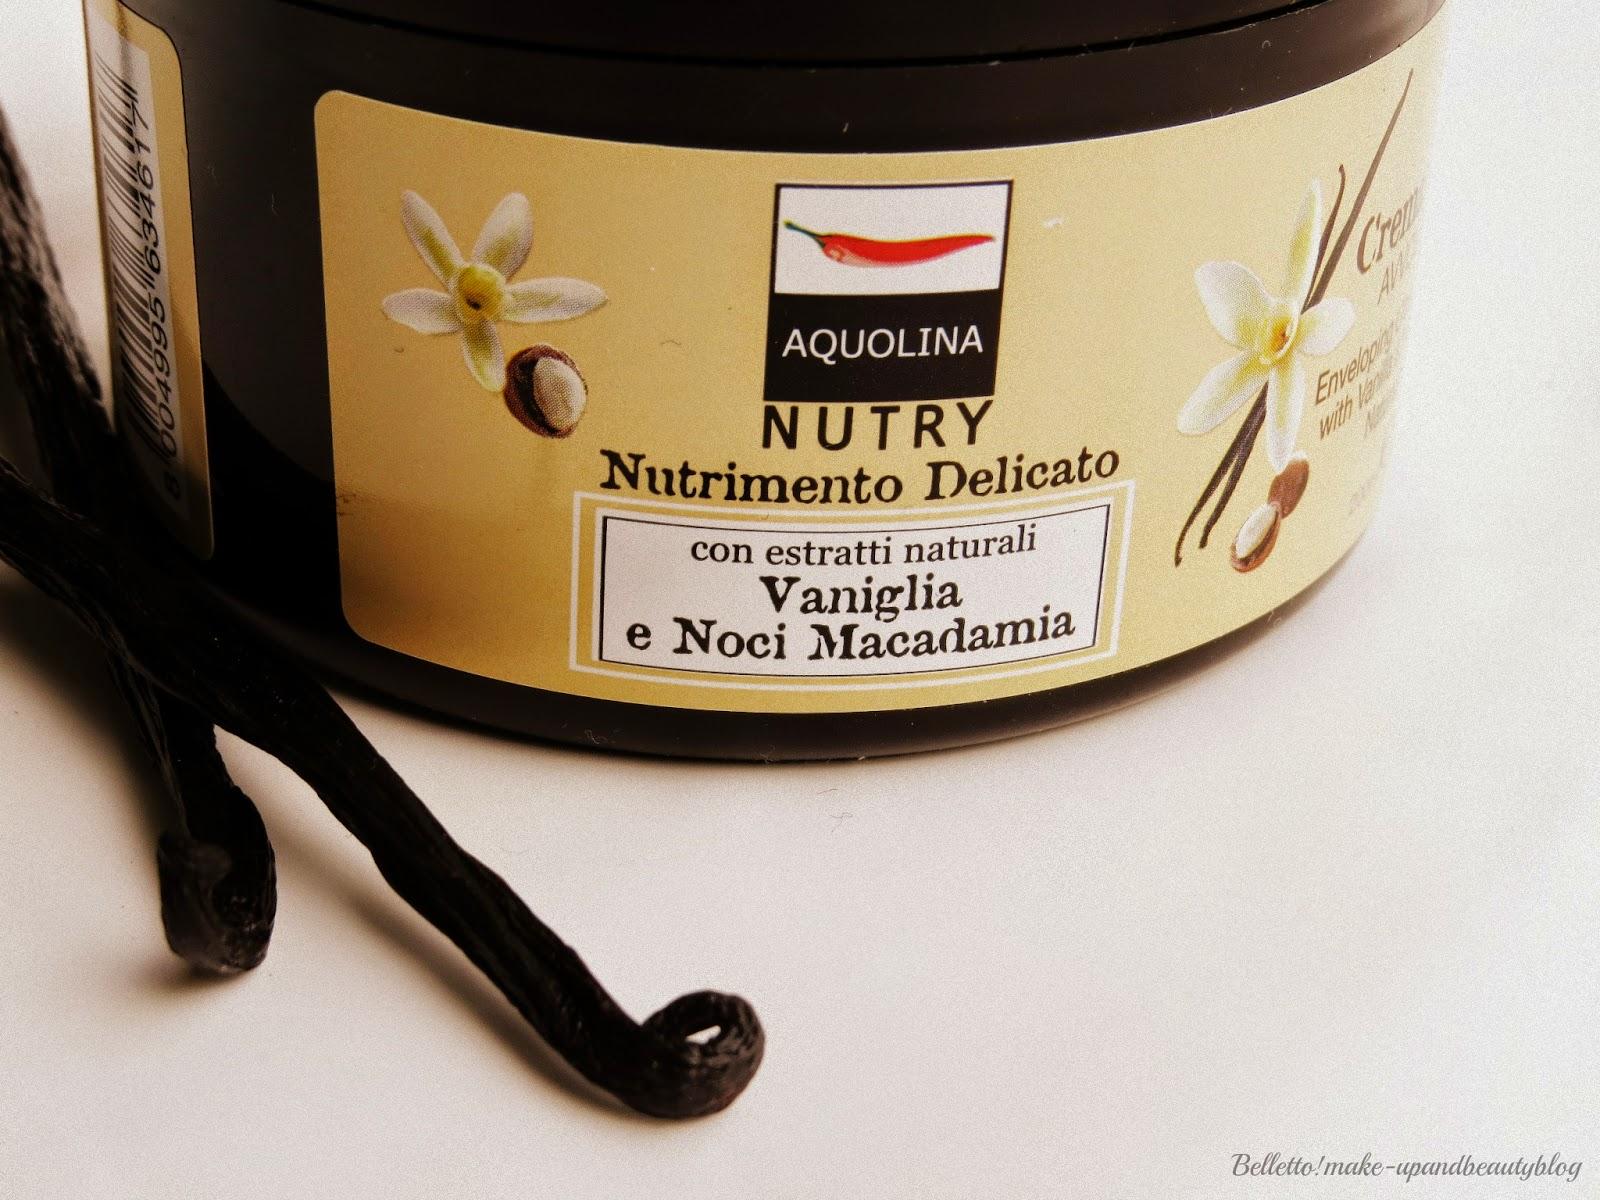 Bagno Doccia Crema Aquolina : Belletto make up and beauty aquolina nutry vaniglia e